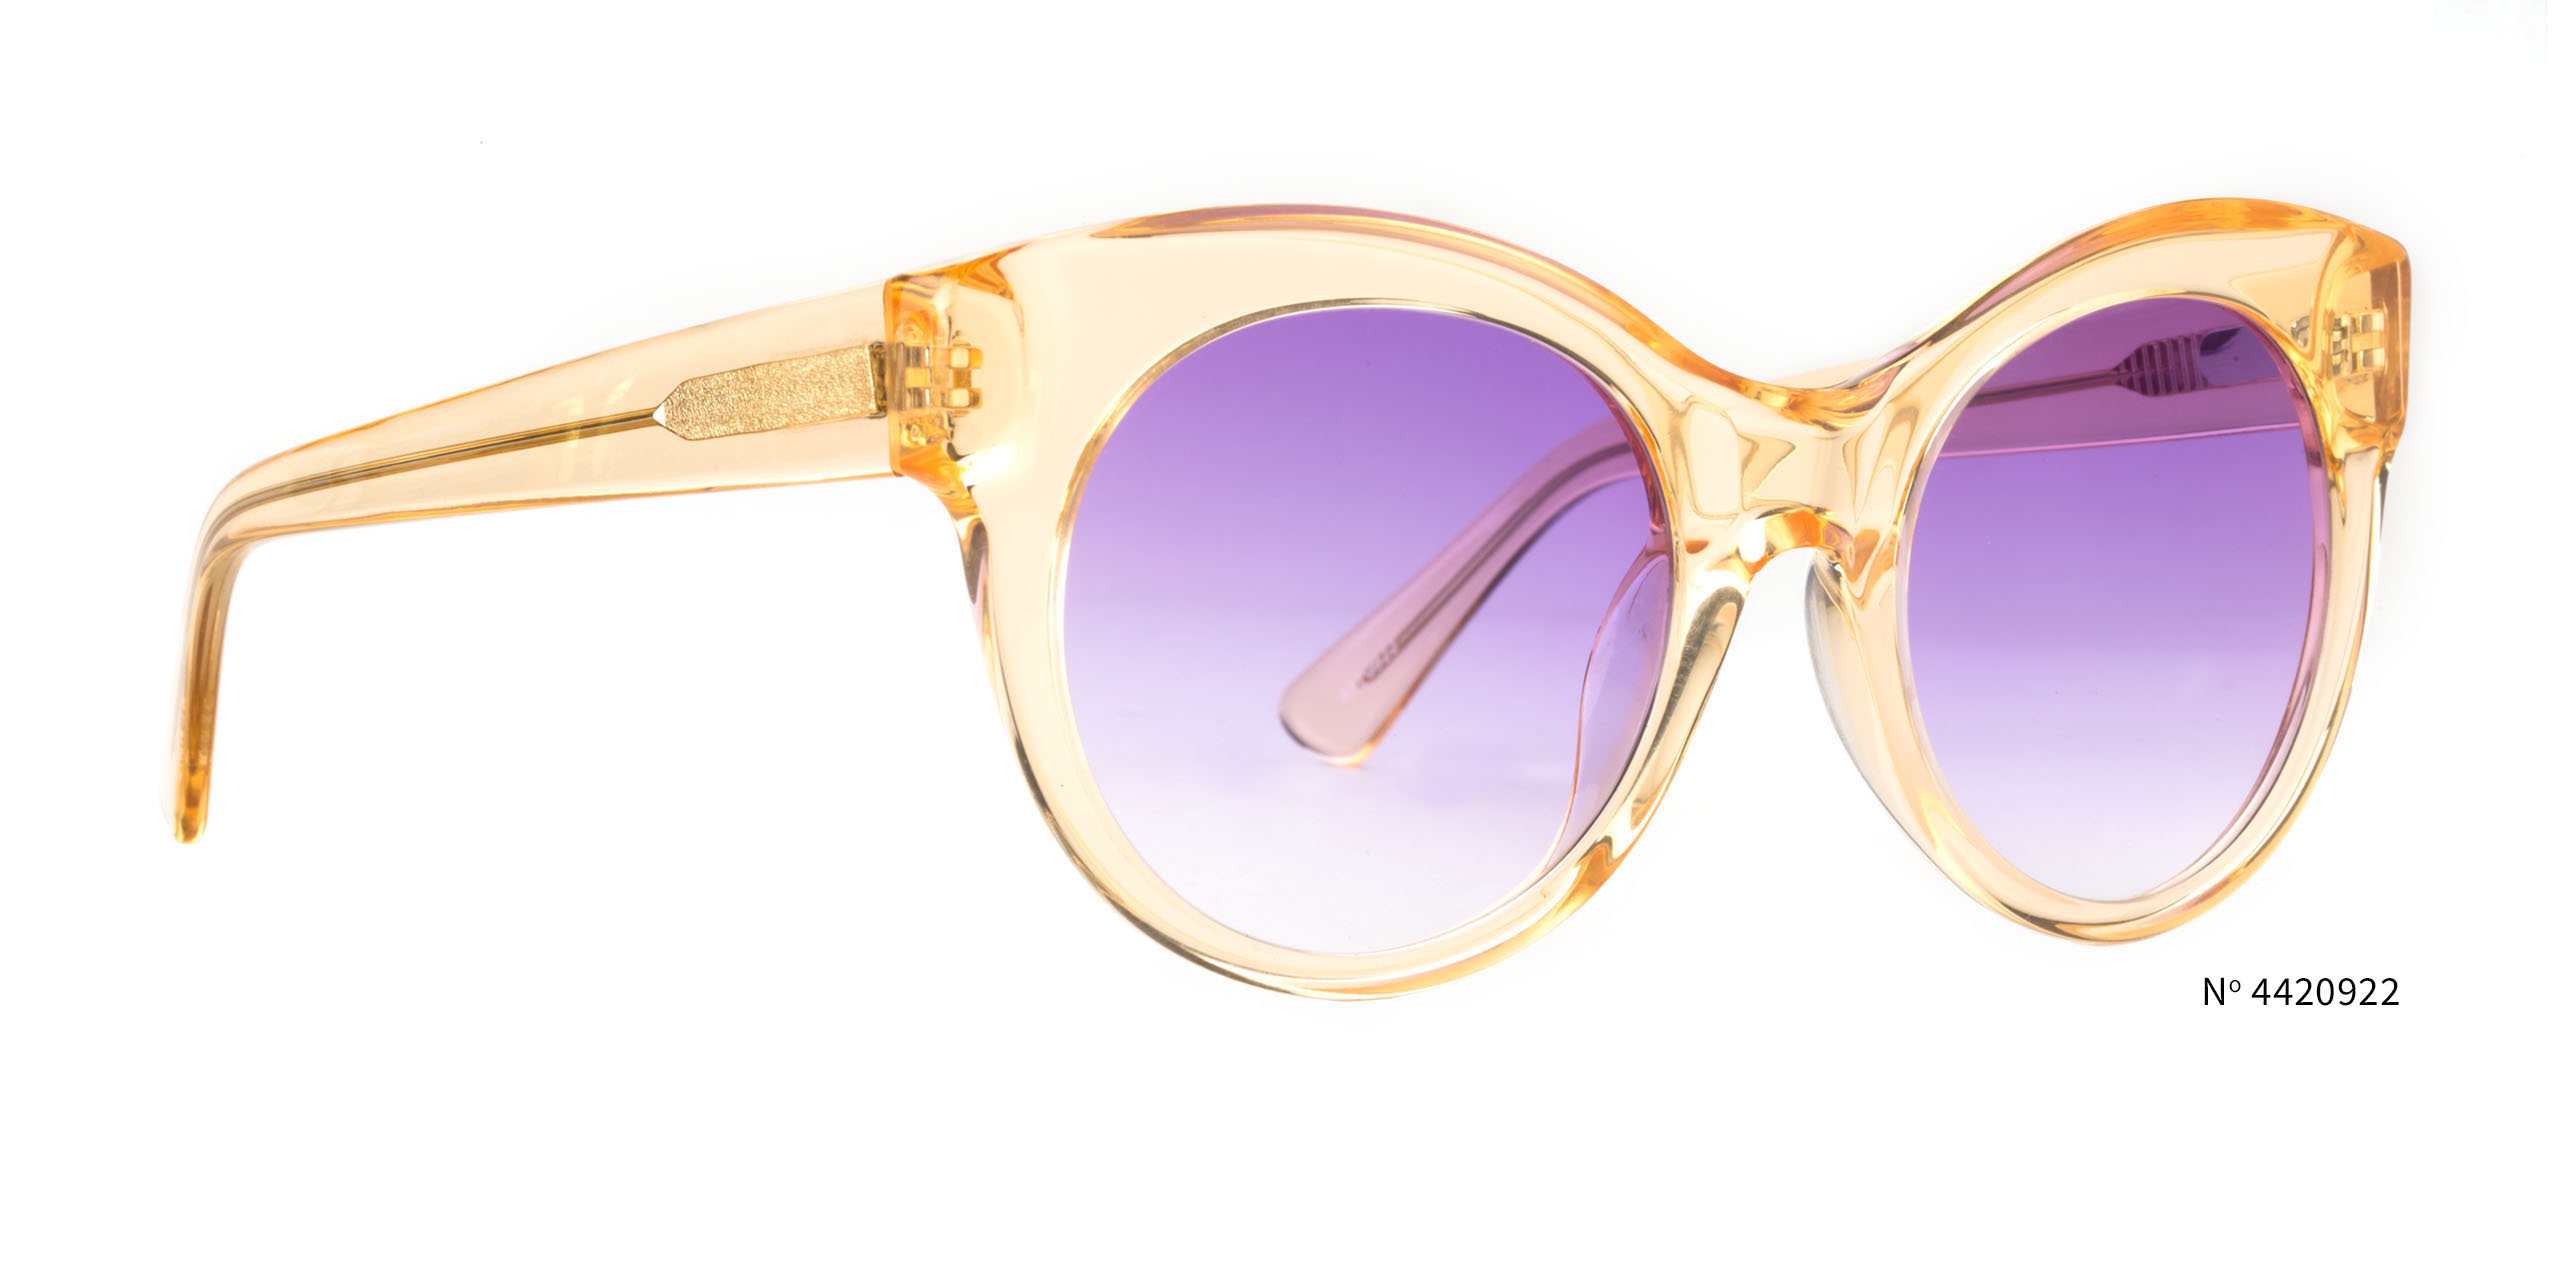 cateye edc glasses